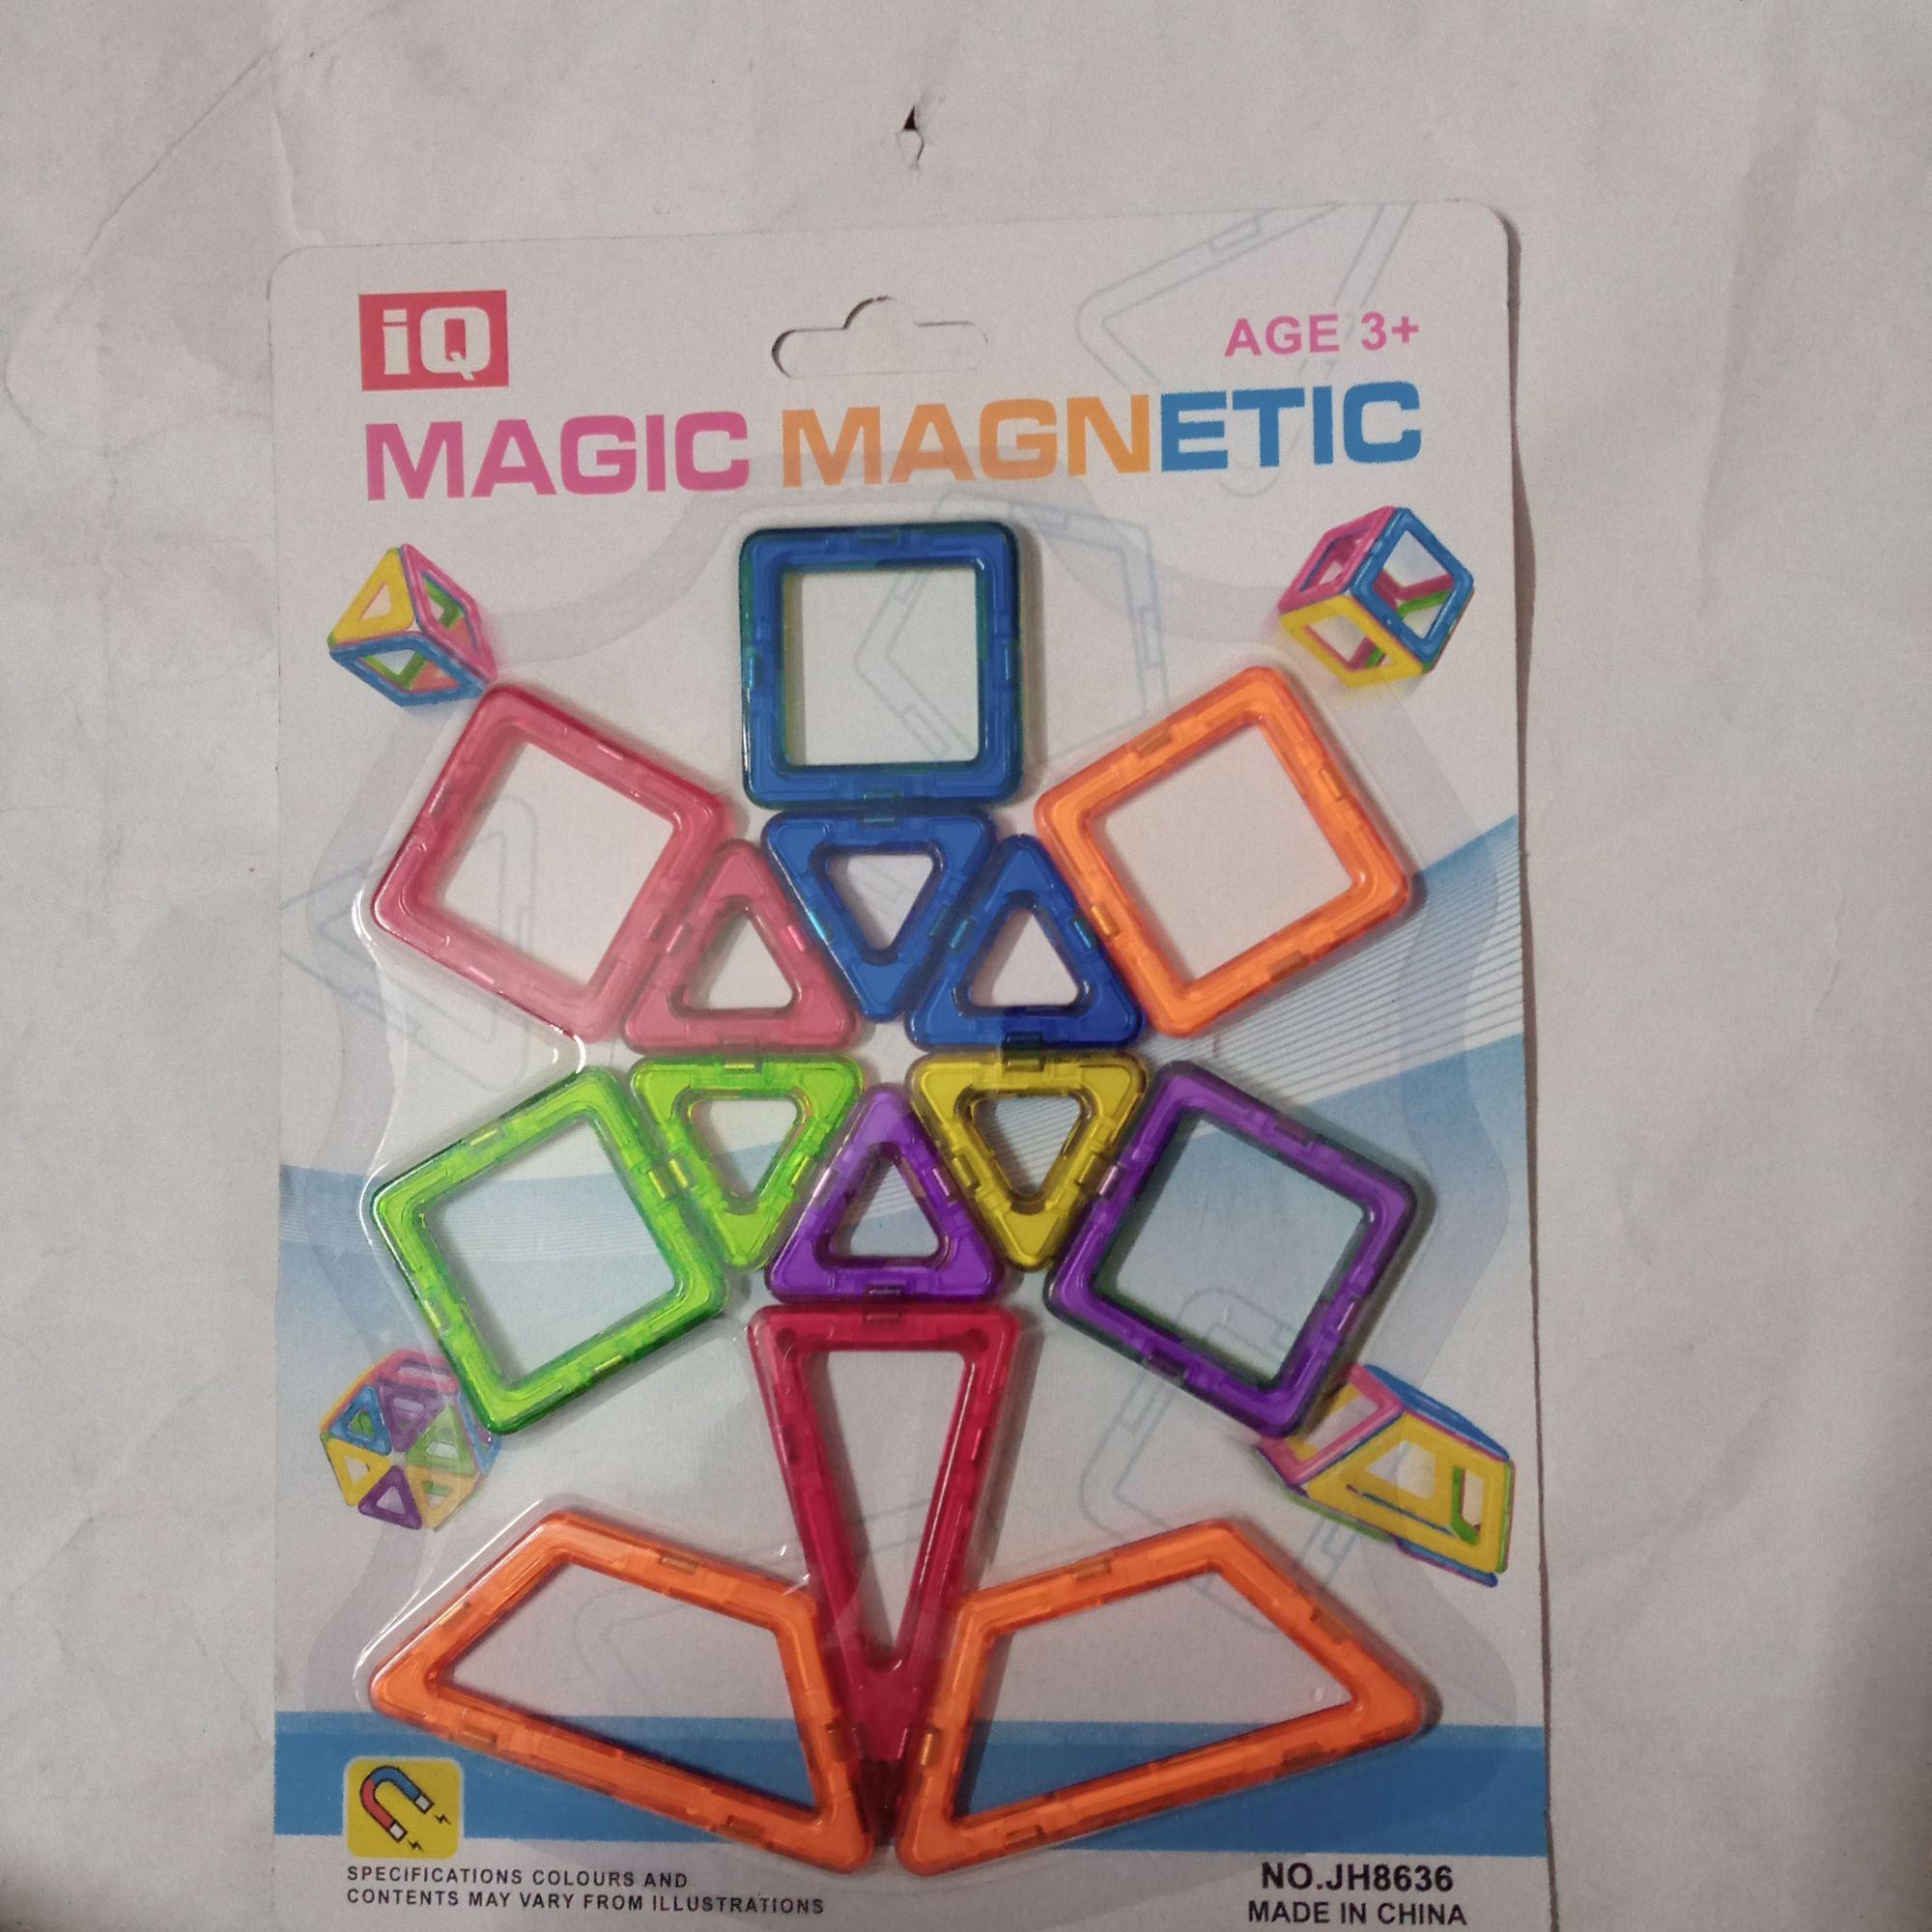 Magnet Toy Magnetic Blocks Magnetic Sticks Magnetic Tiles Building Blocks Metalic Plastic Magnetic Novelty Kid's / Adults' Boys' Girls' Toy Gift